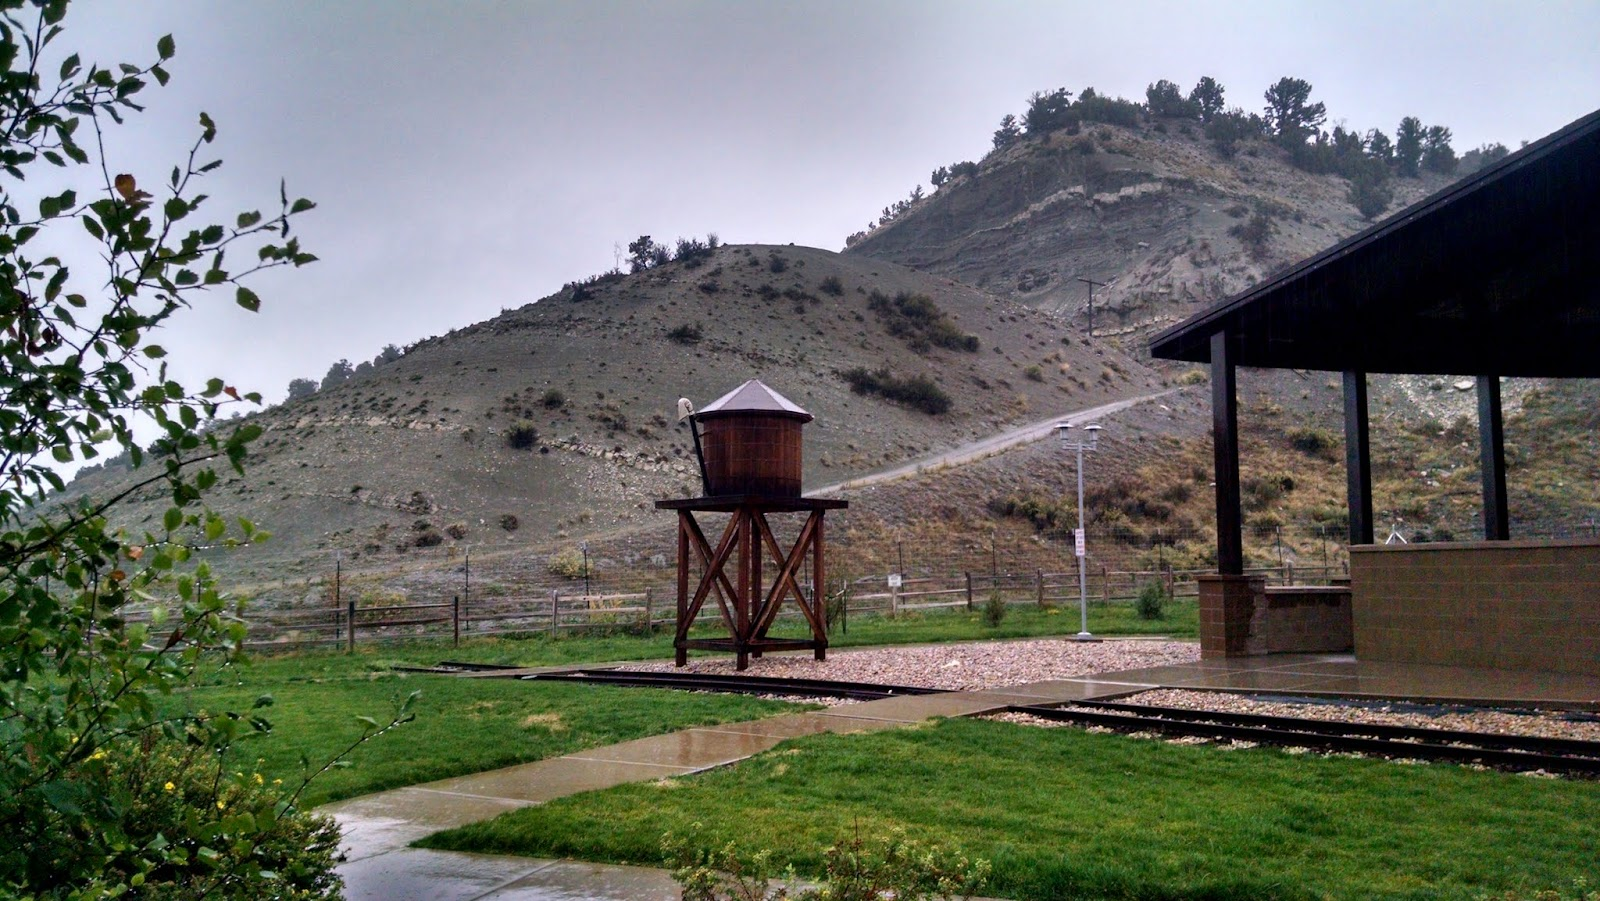 Зона отдыха Тай Форк, Юта (Tie Fork rest area, UT)